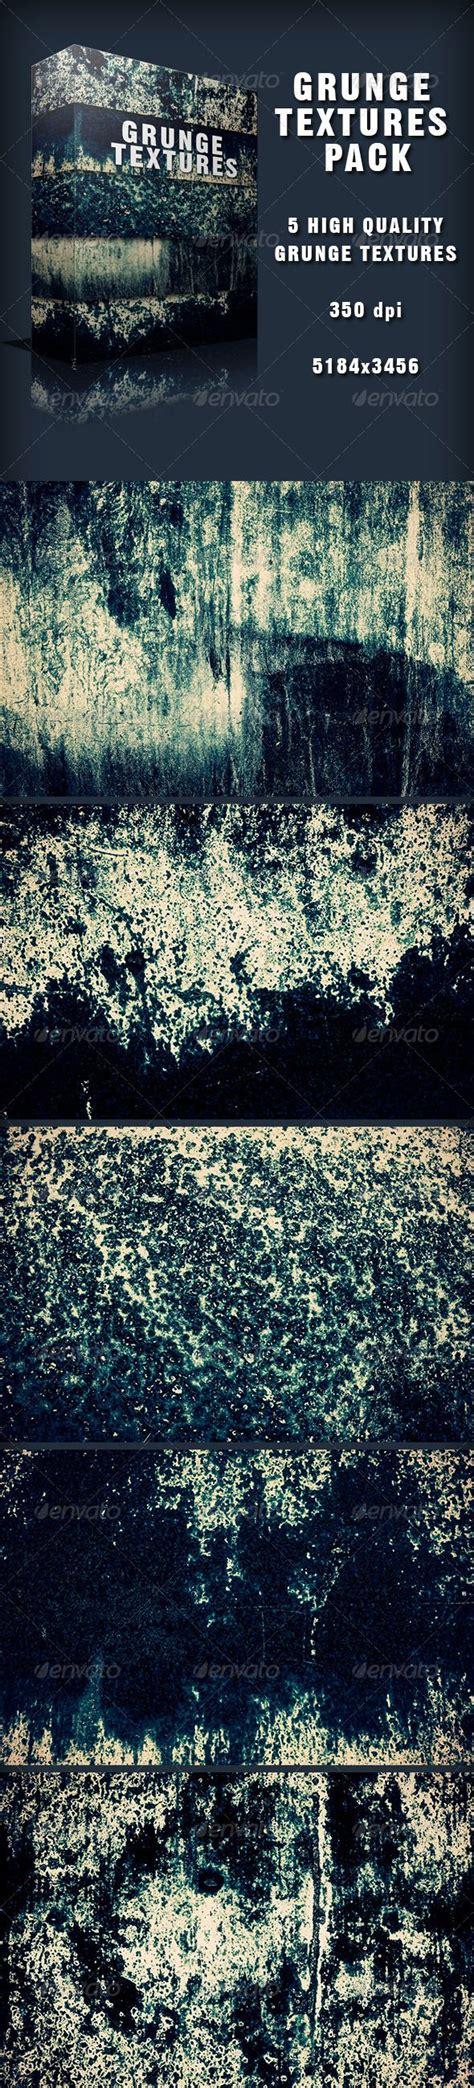 5 high quality grunge textures 350 dpi 51843456 Grunge